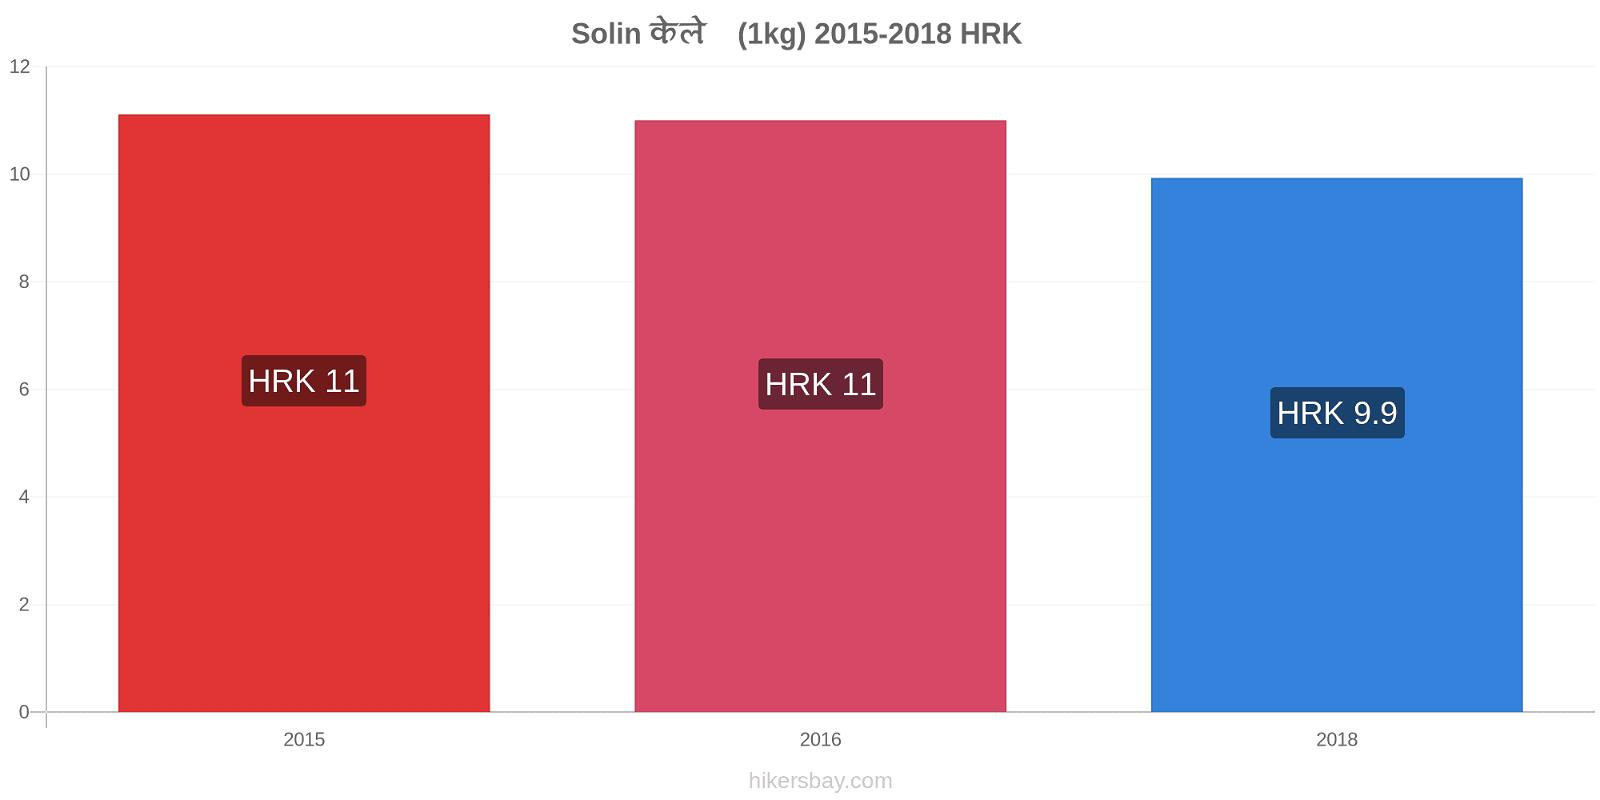 Solin मूल्य परिवर्तन केले (1kg) hikersbay.com